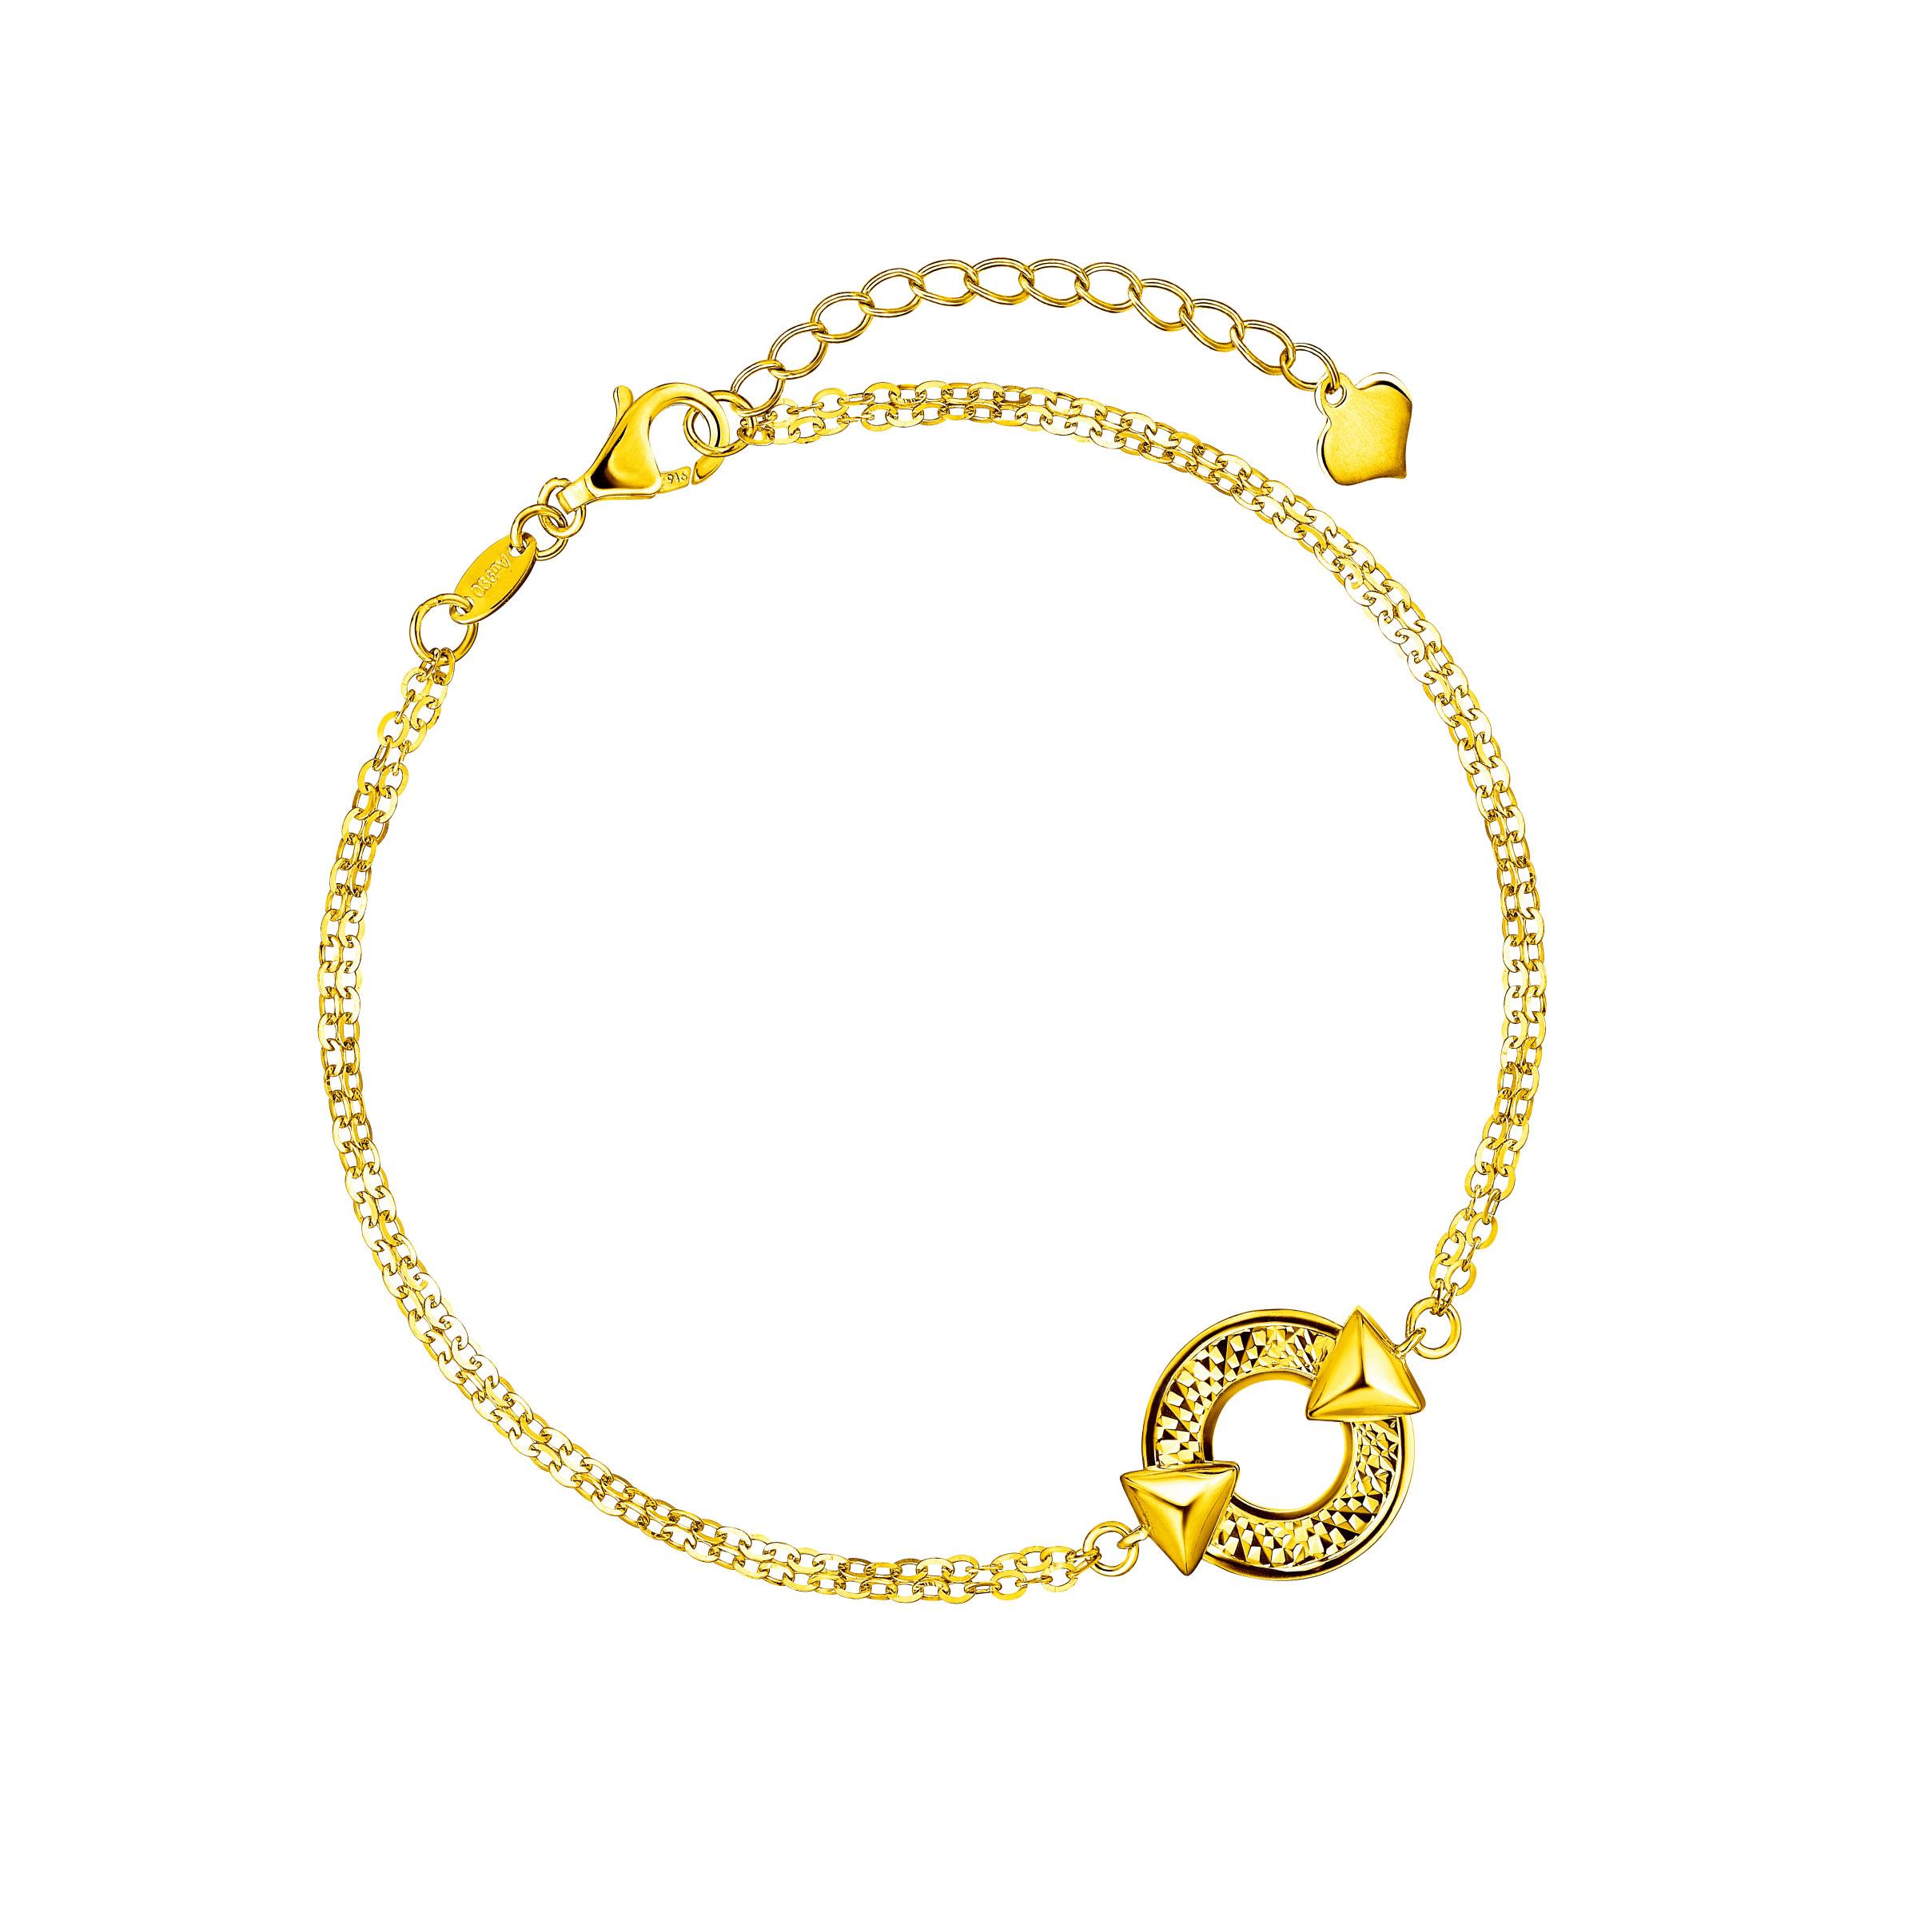 Goldstyle「良缘」手链